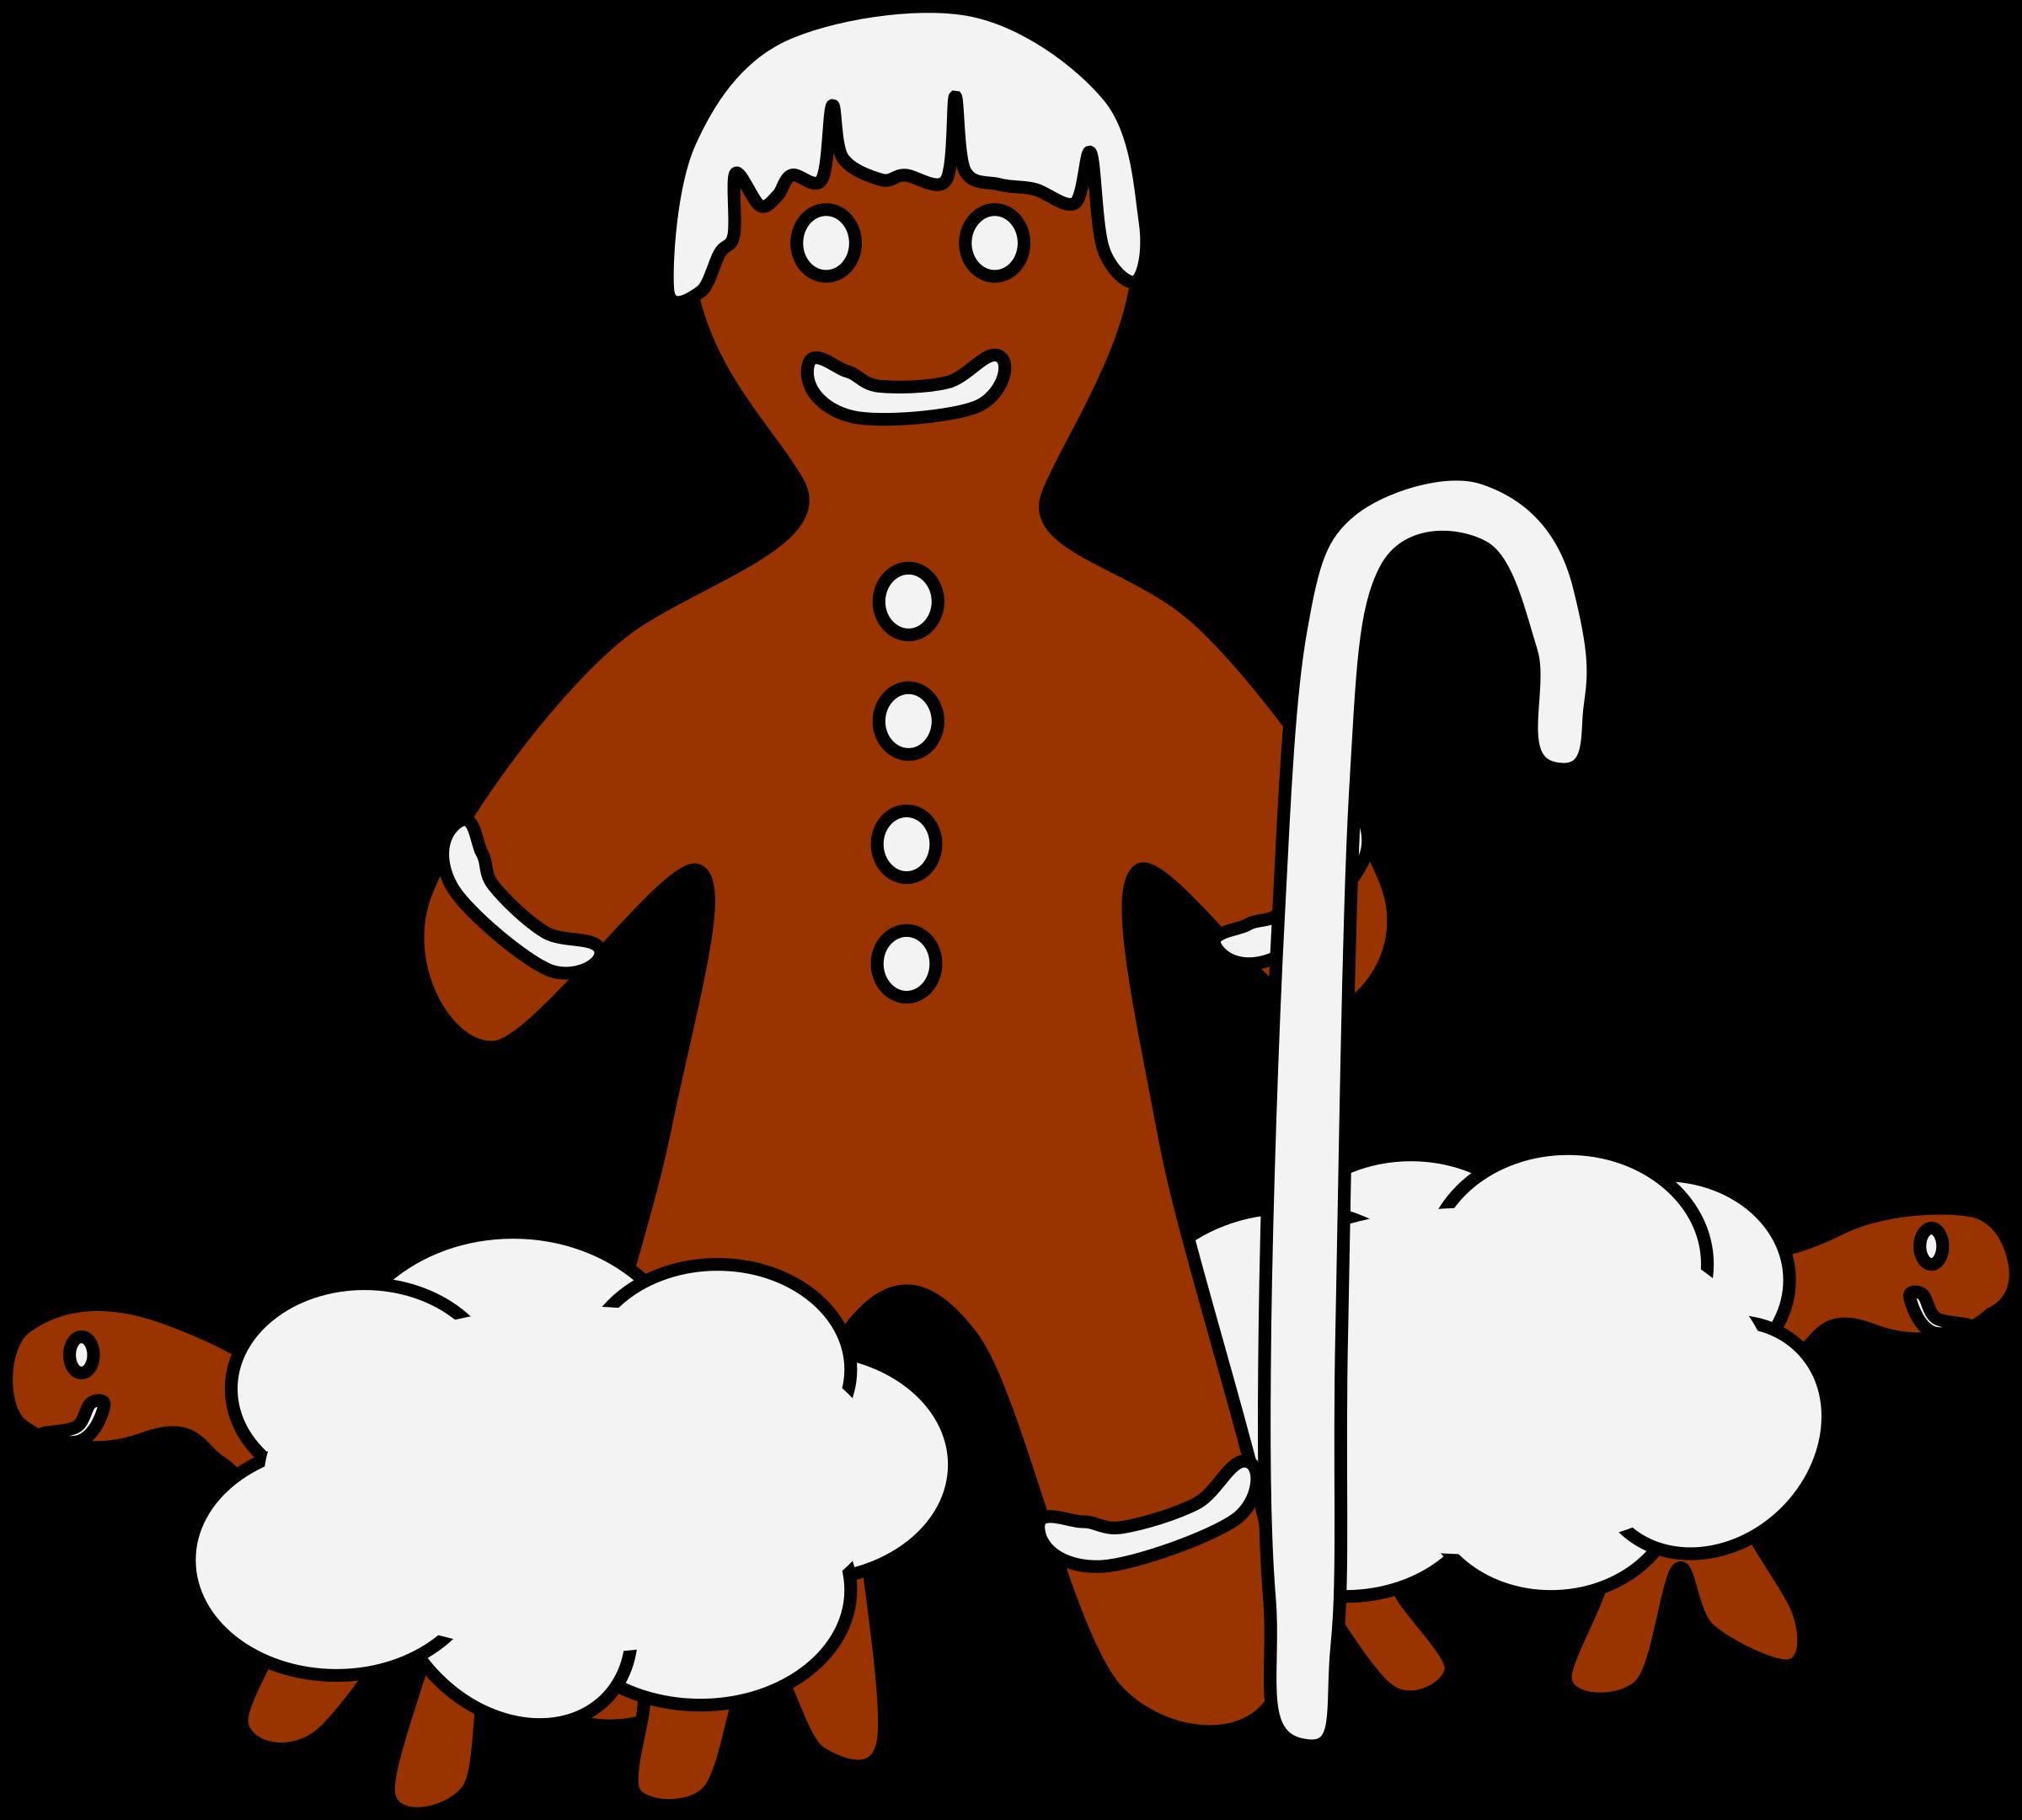 Gingerbread shepherd big image. Moses clipart sheperd